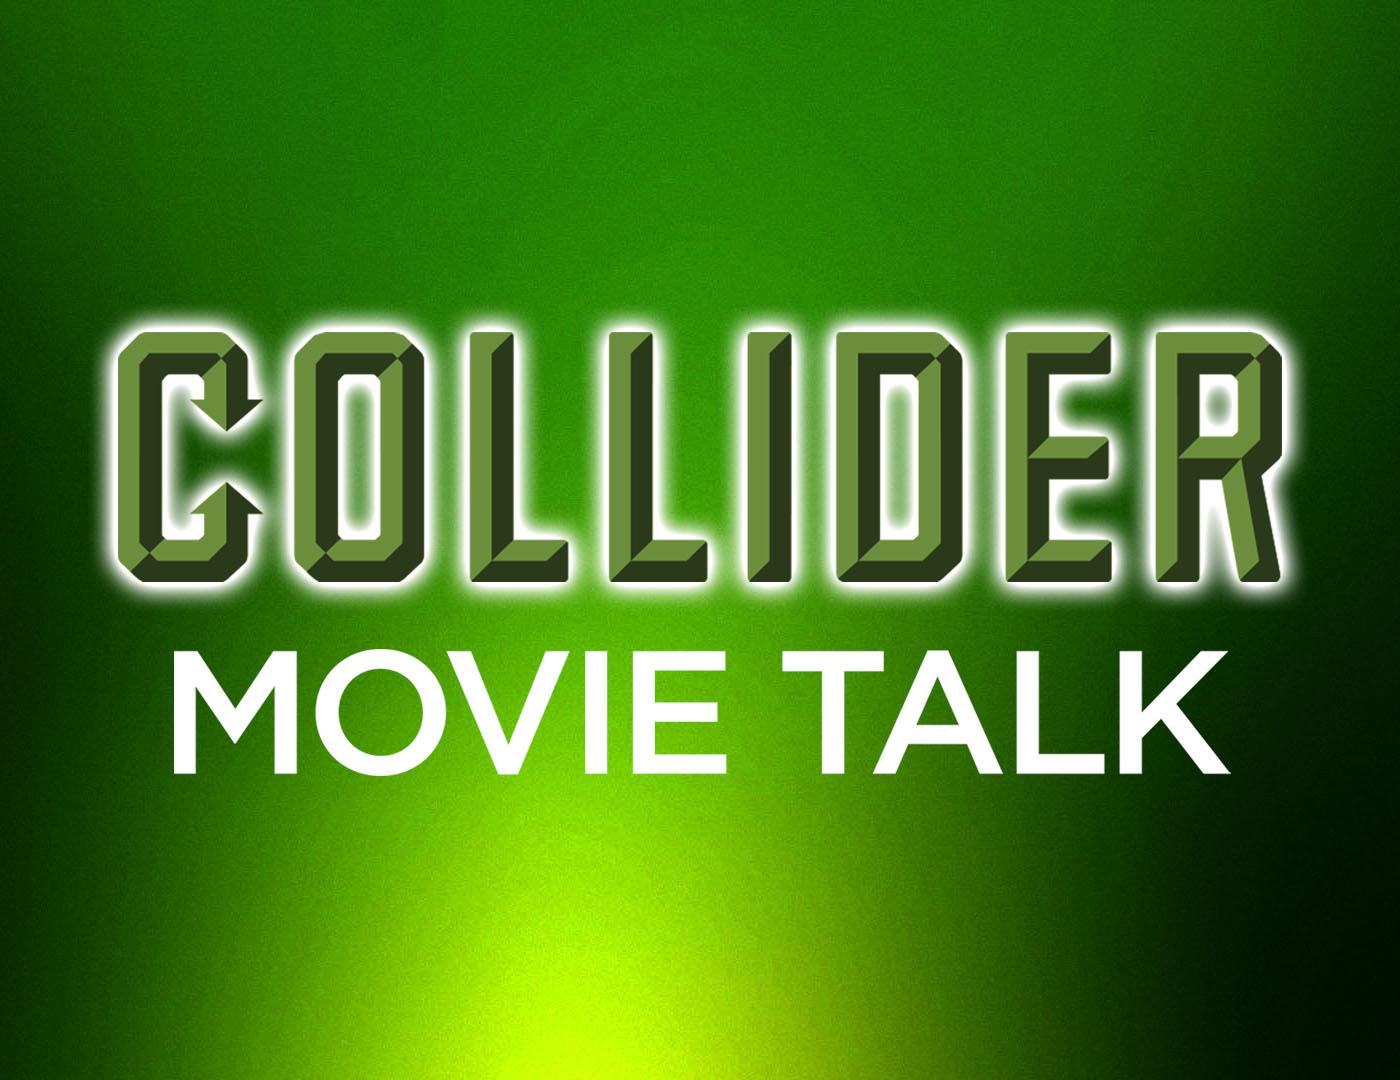 Collider Movie Talk - Avatar 2 Delayed, Cate Blanchett Playing Hela in Thor 3?